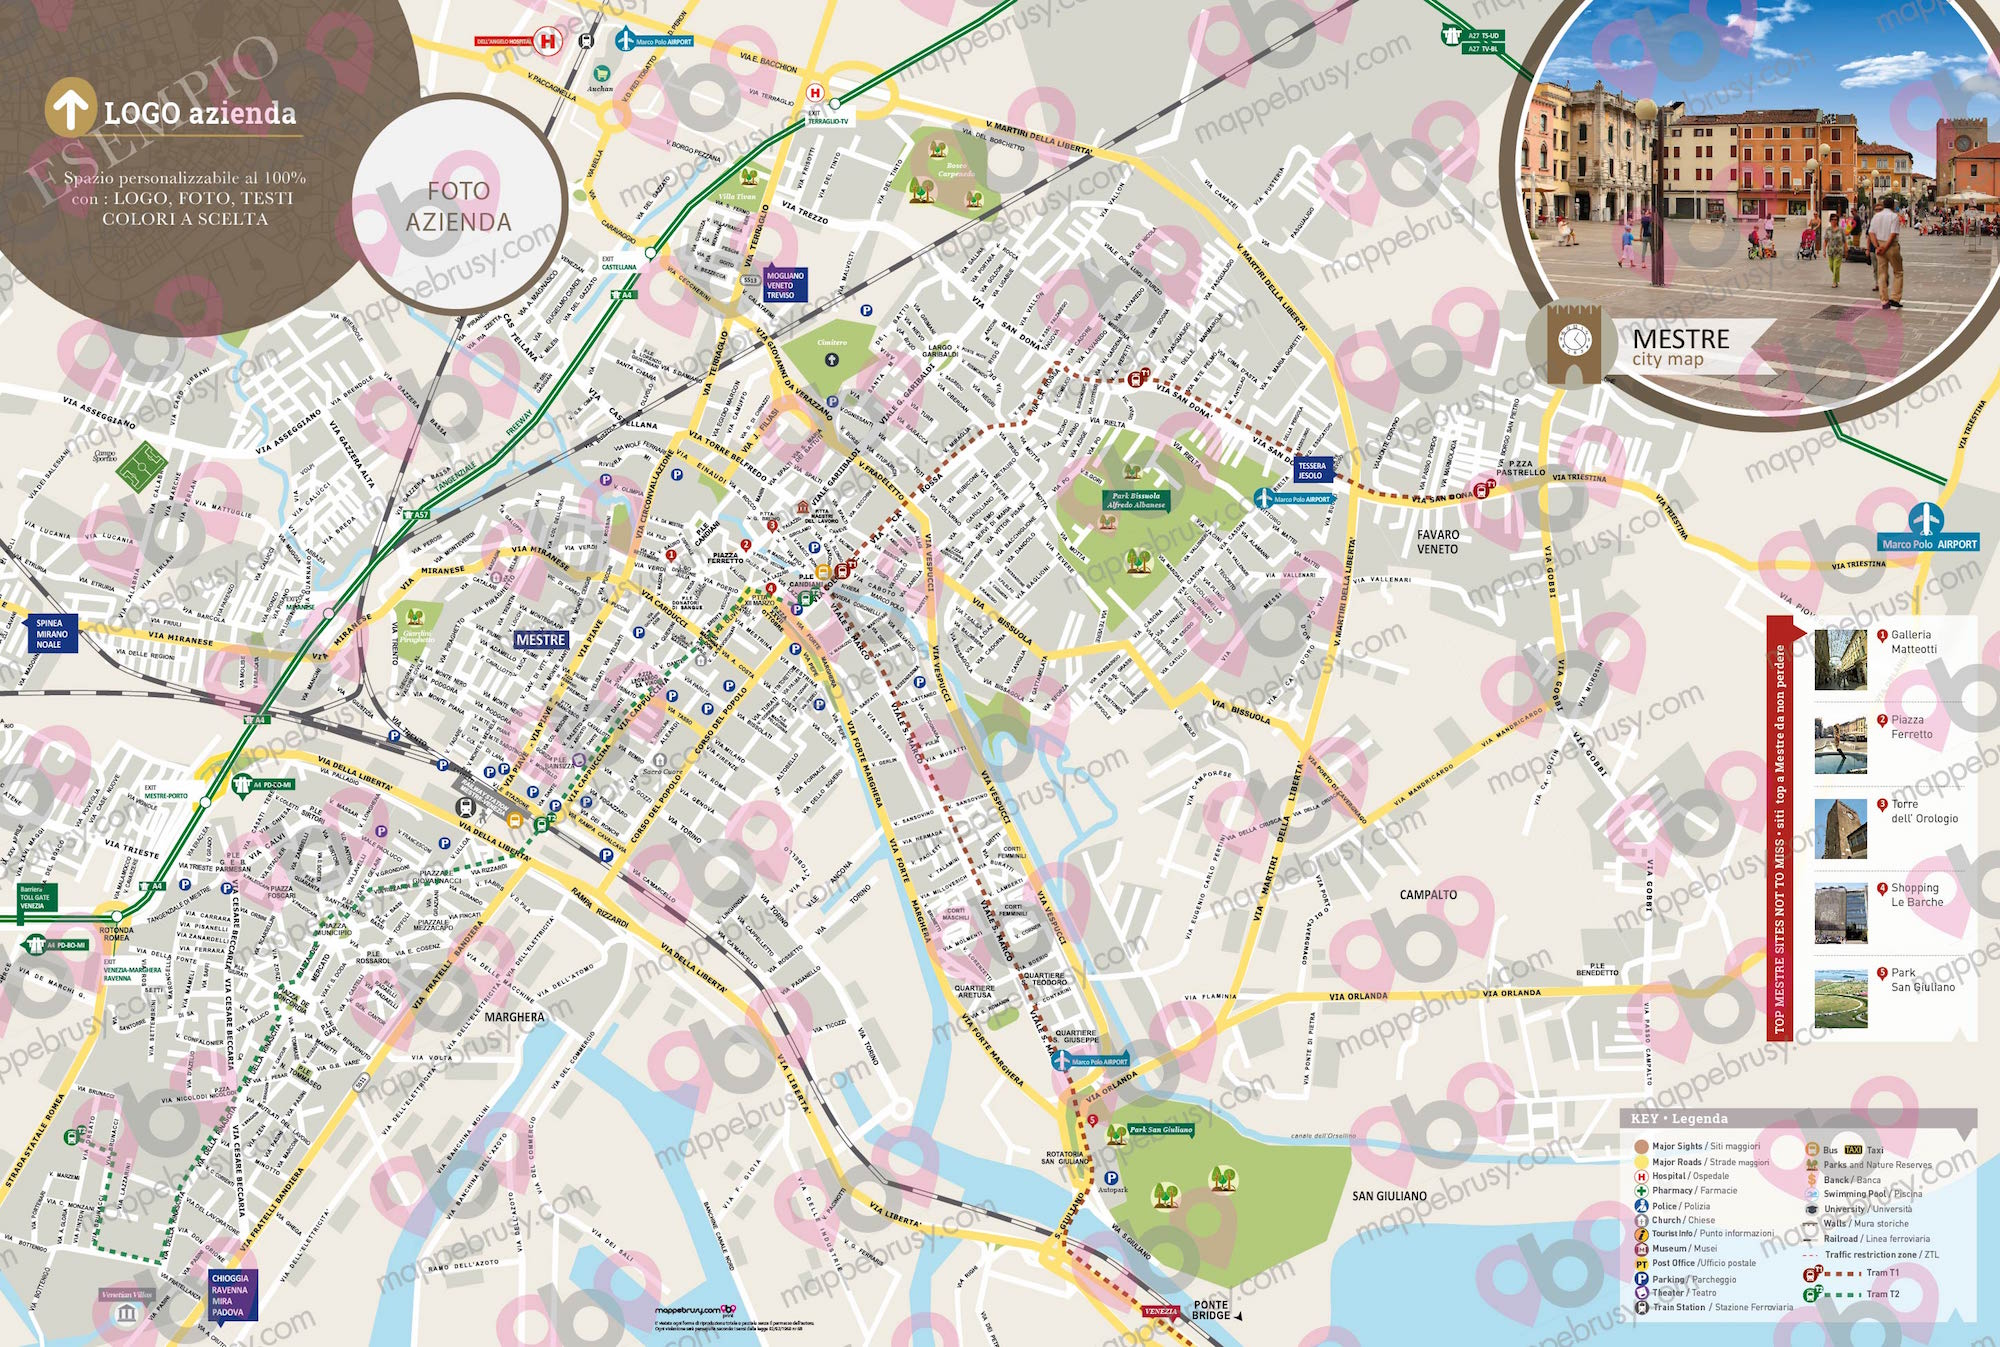 Cartina Venezia Centro Storico.Mestre Venezia Mappe Brusy